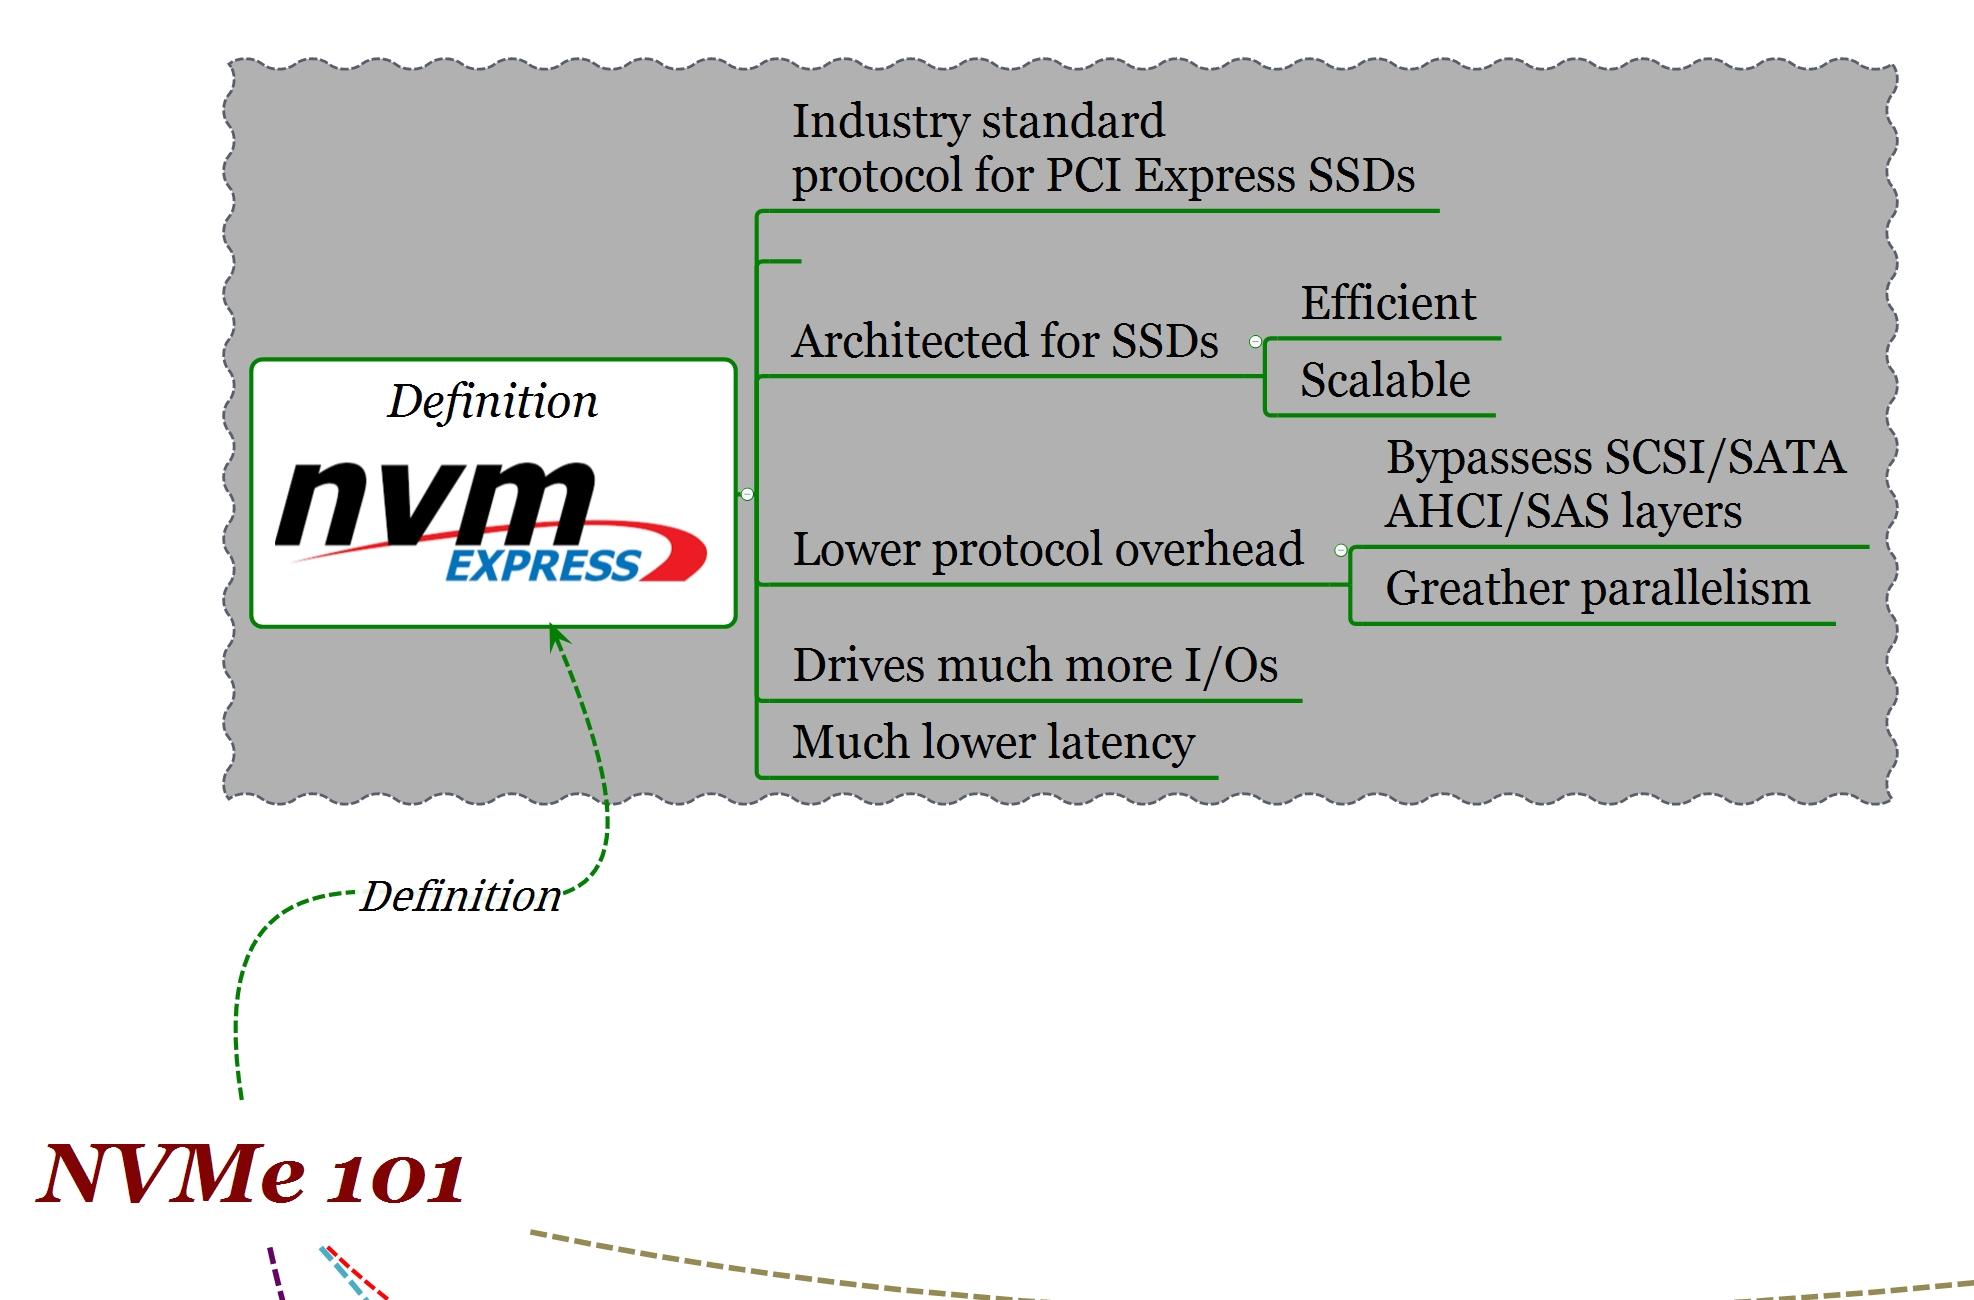 NVMe 101: Definition